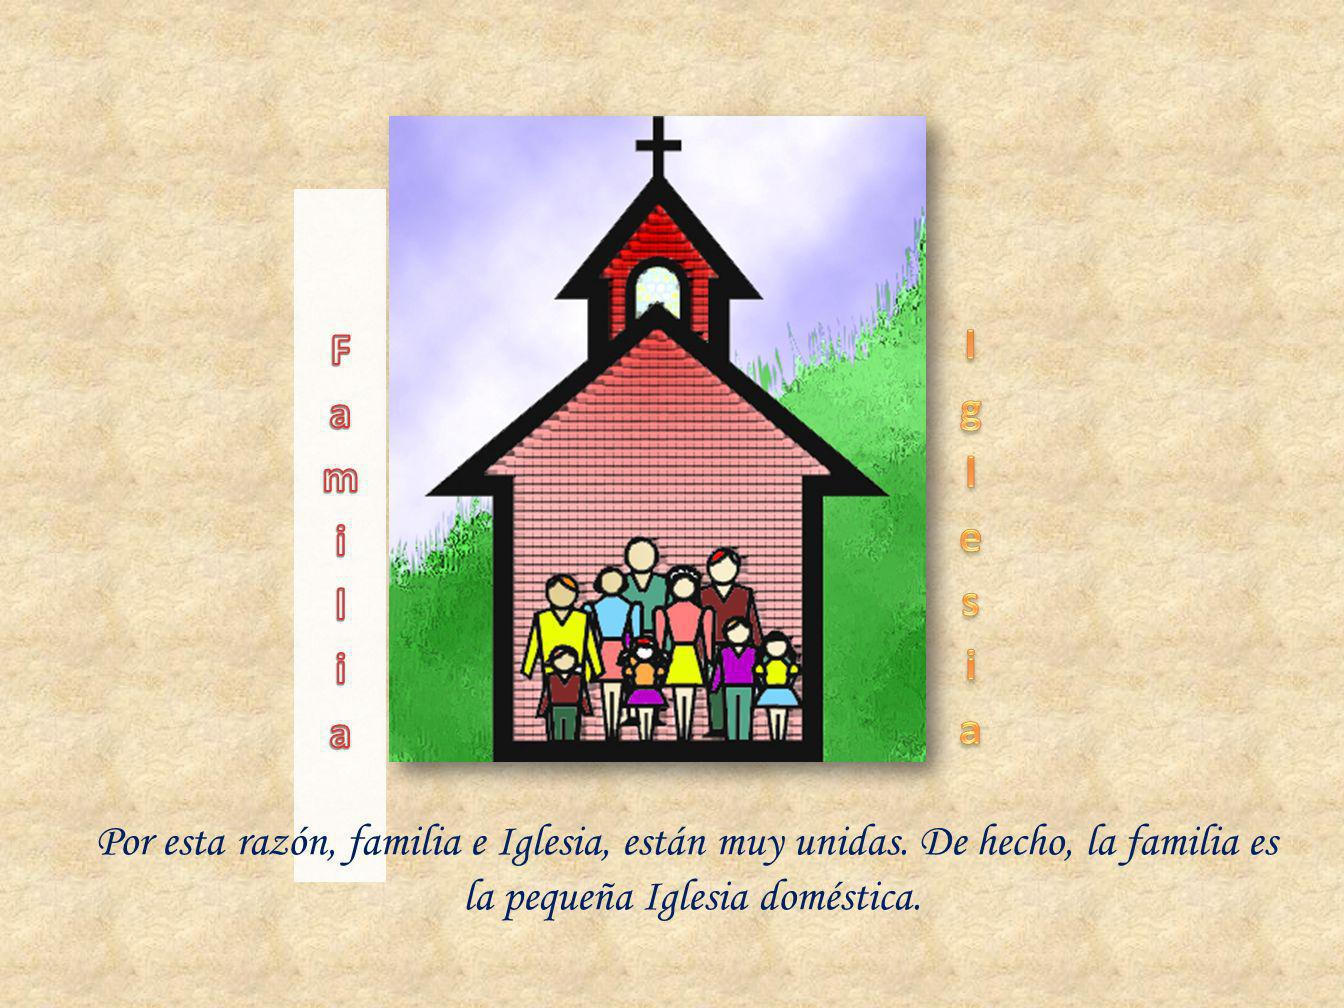 FamiliaIglesia.Por esta razón, familia e Iglesia, están muy unidas.